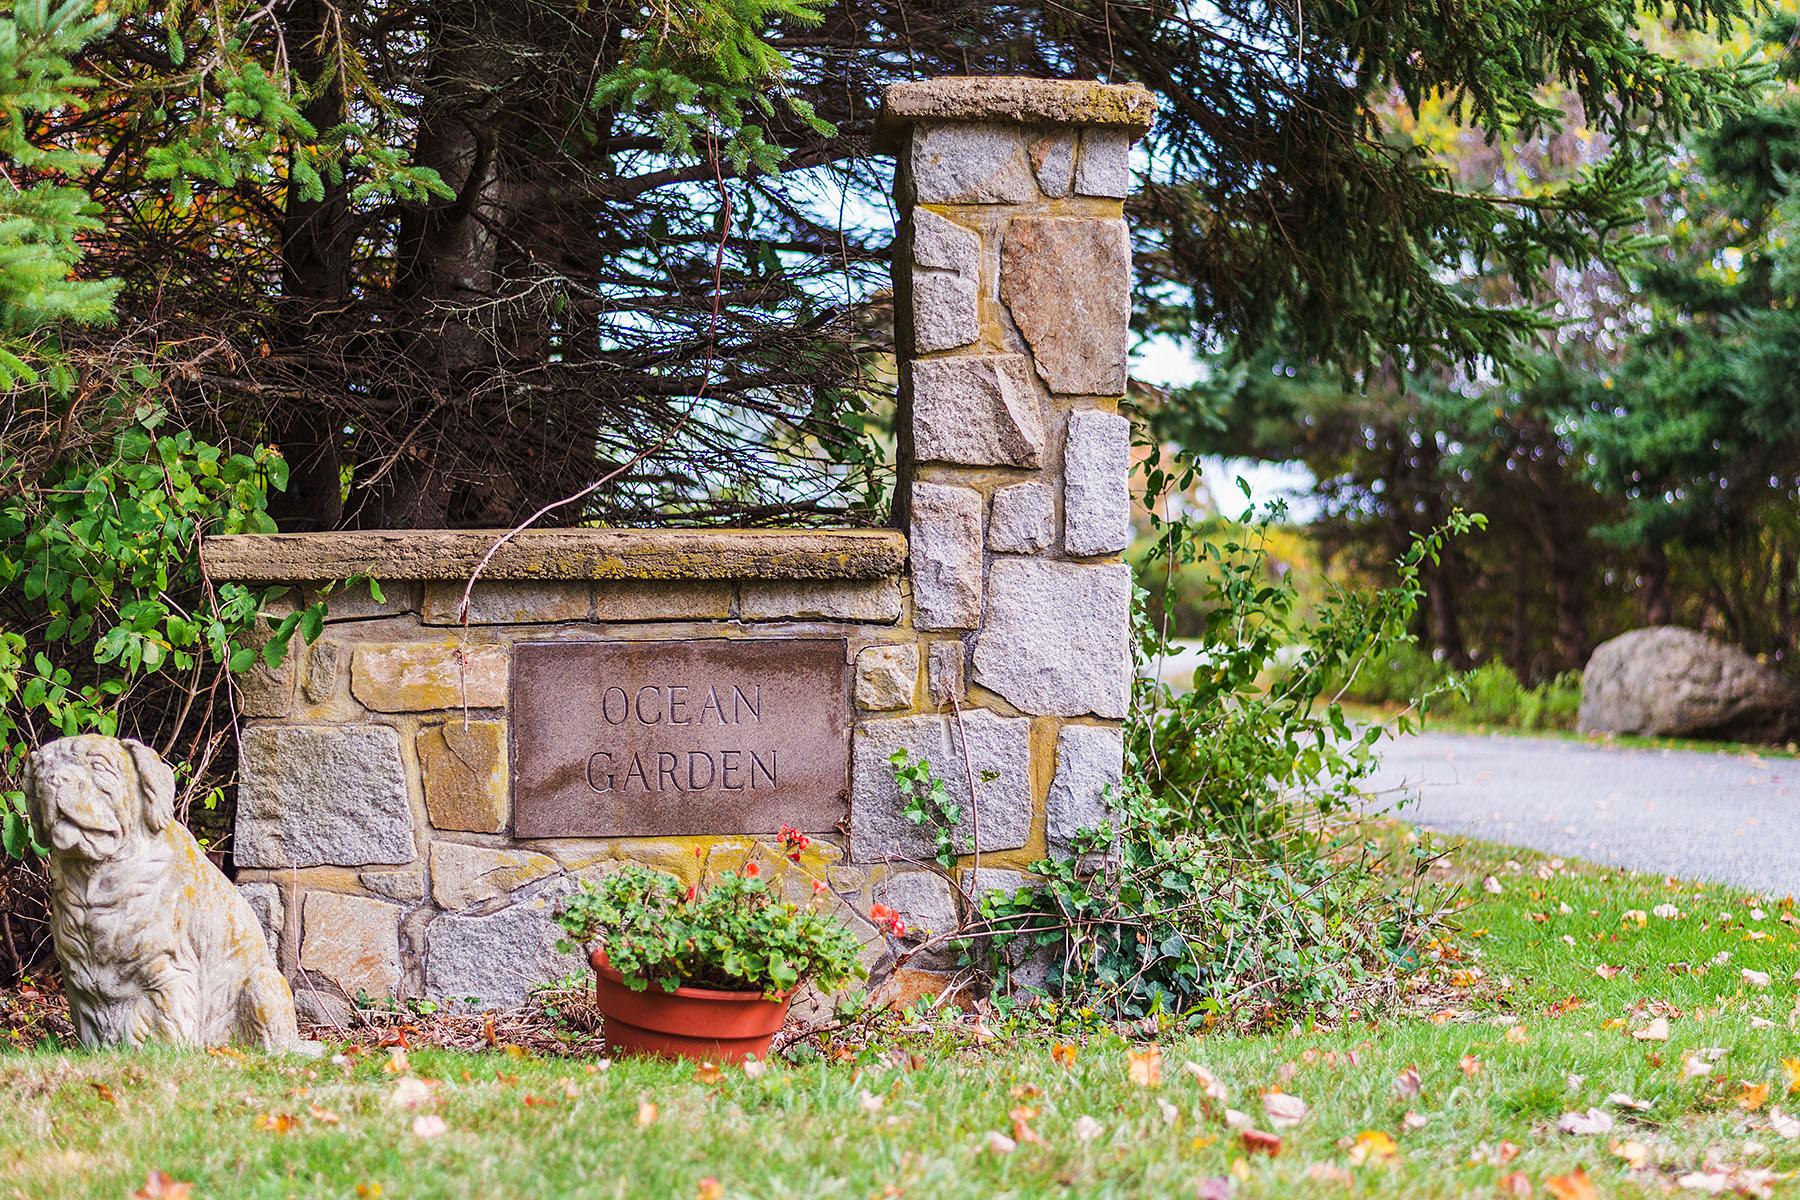 Land for Sale at 35 Peaked Rock Rd, Narragansett, RI Narragansett, Rhode Island 02882 United States